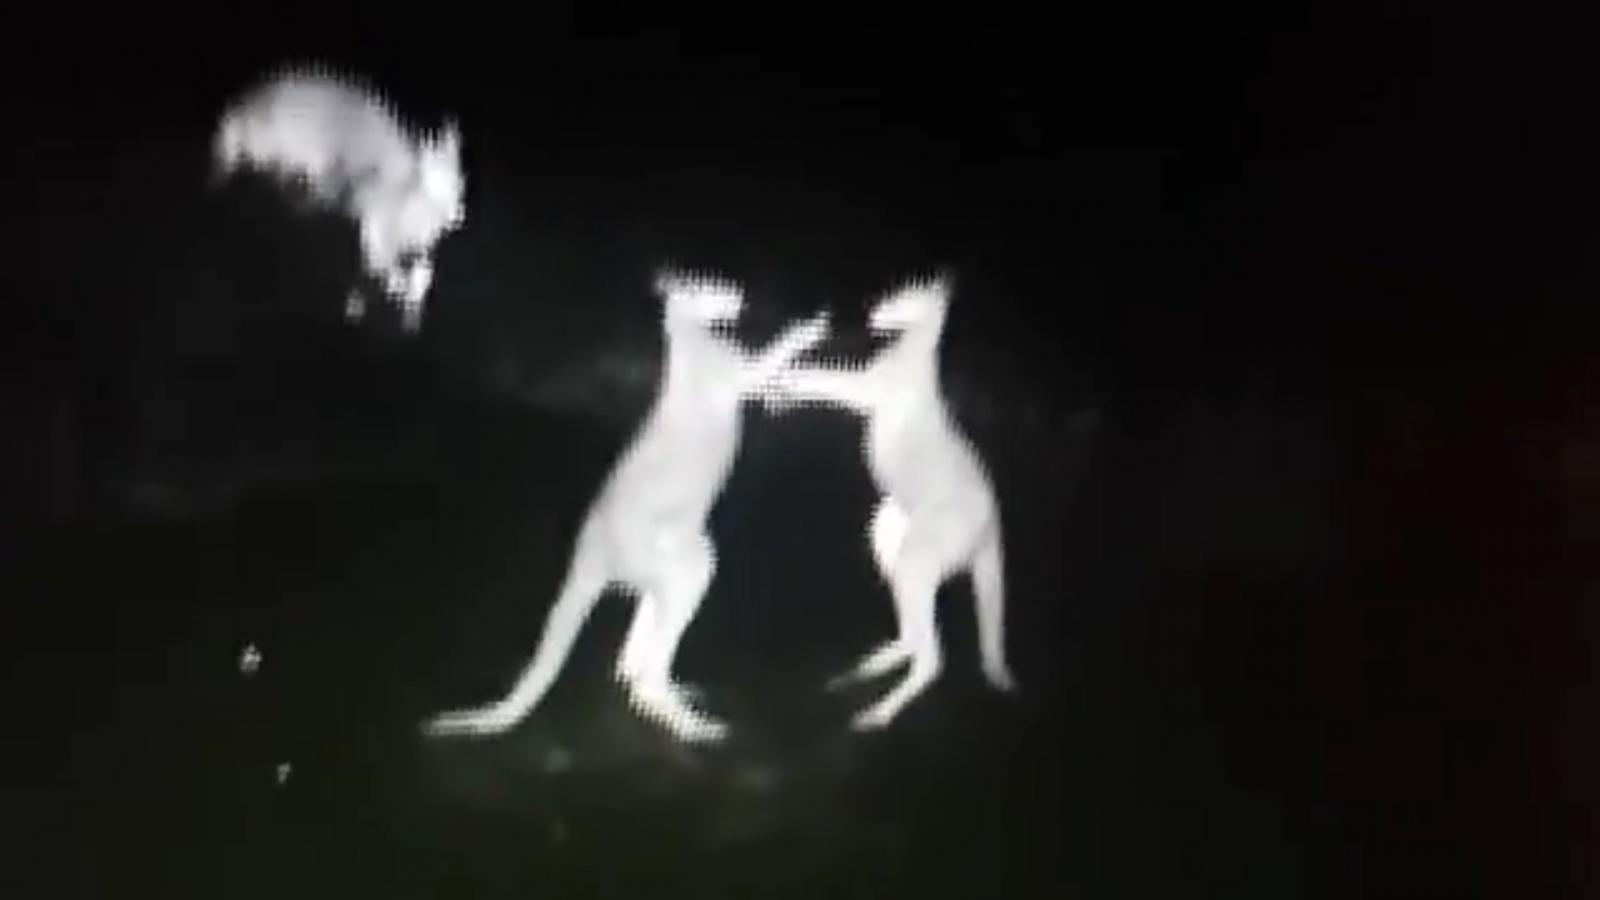 kangaroo-fight-caught-on-police-infrared-camera